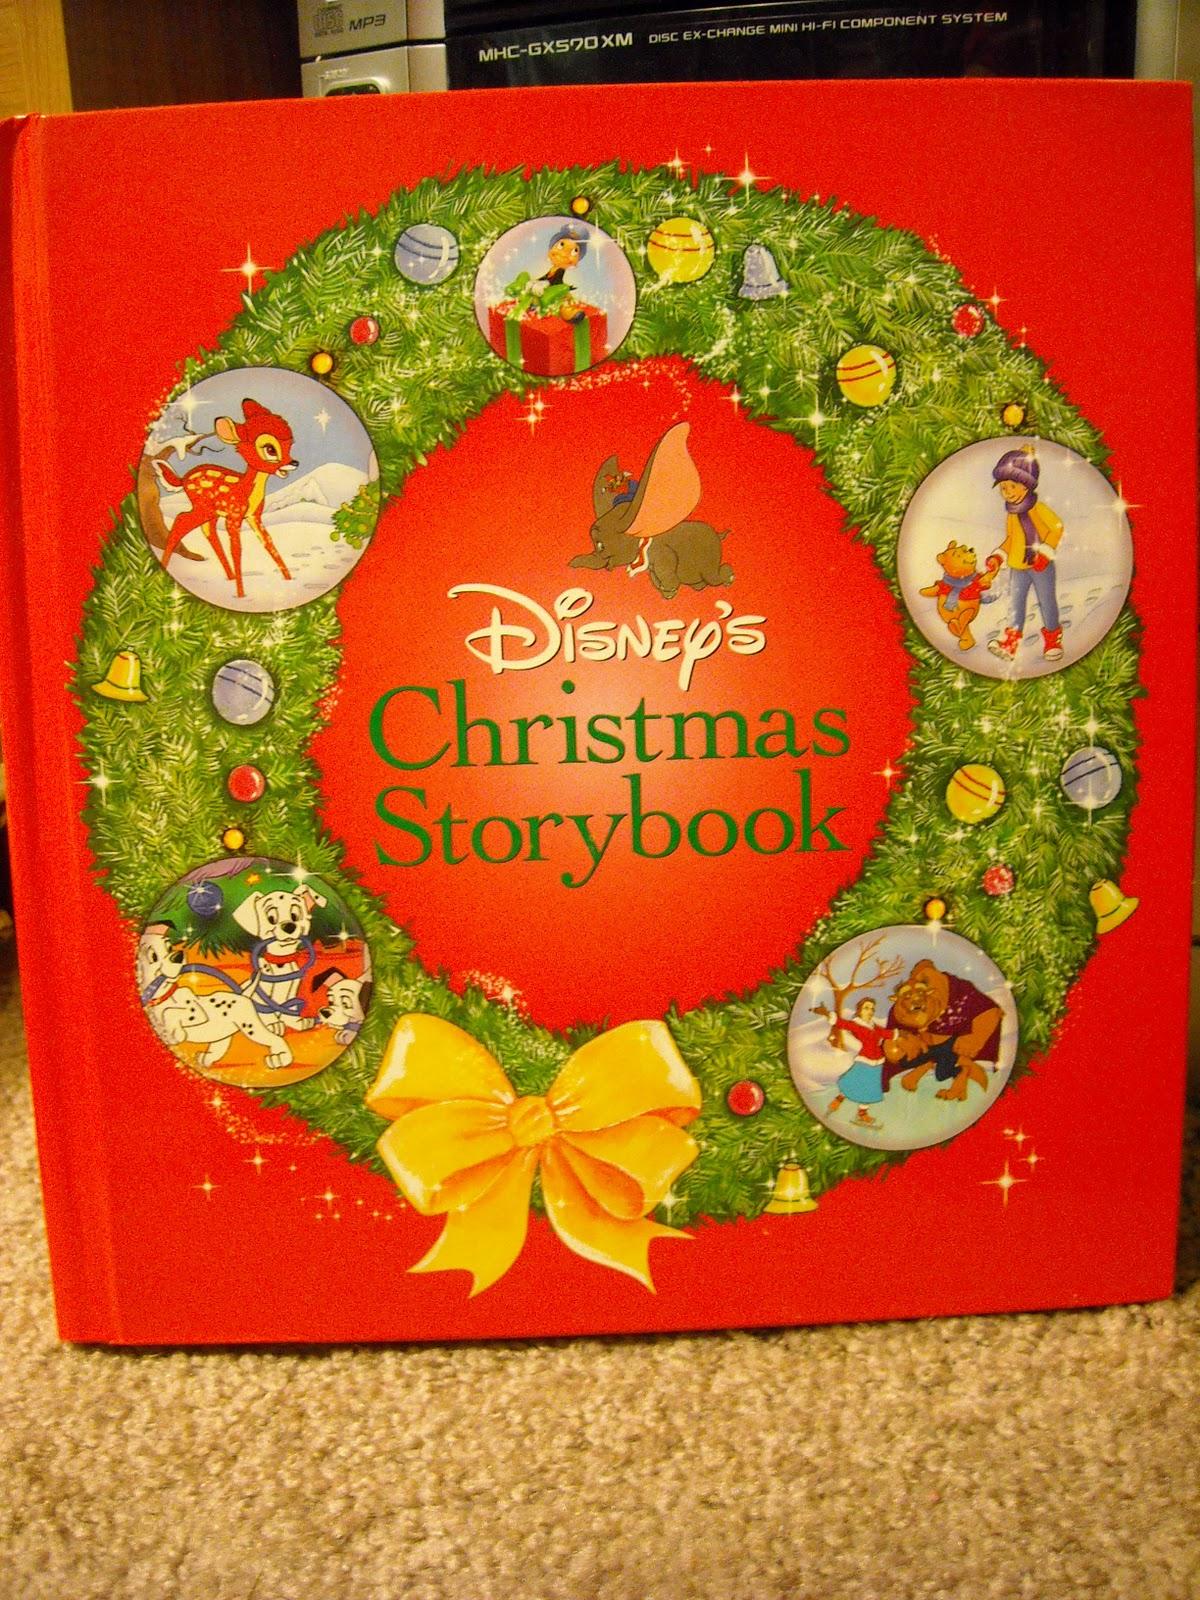 disneys christmas storybook - Disney Christmas Storybook Collection